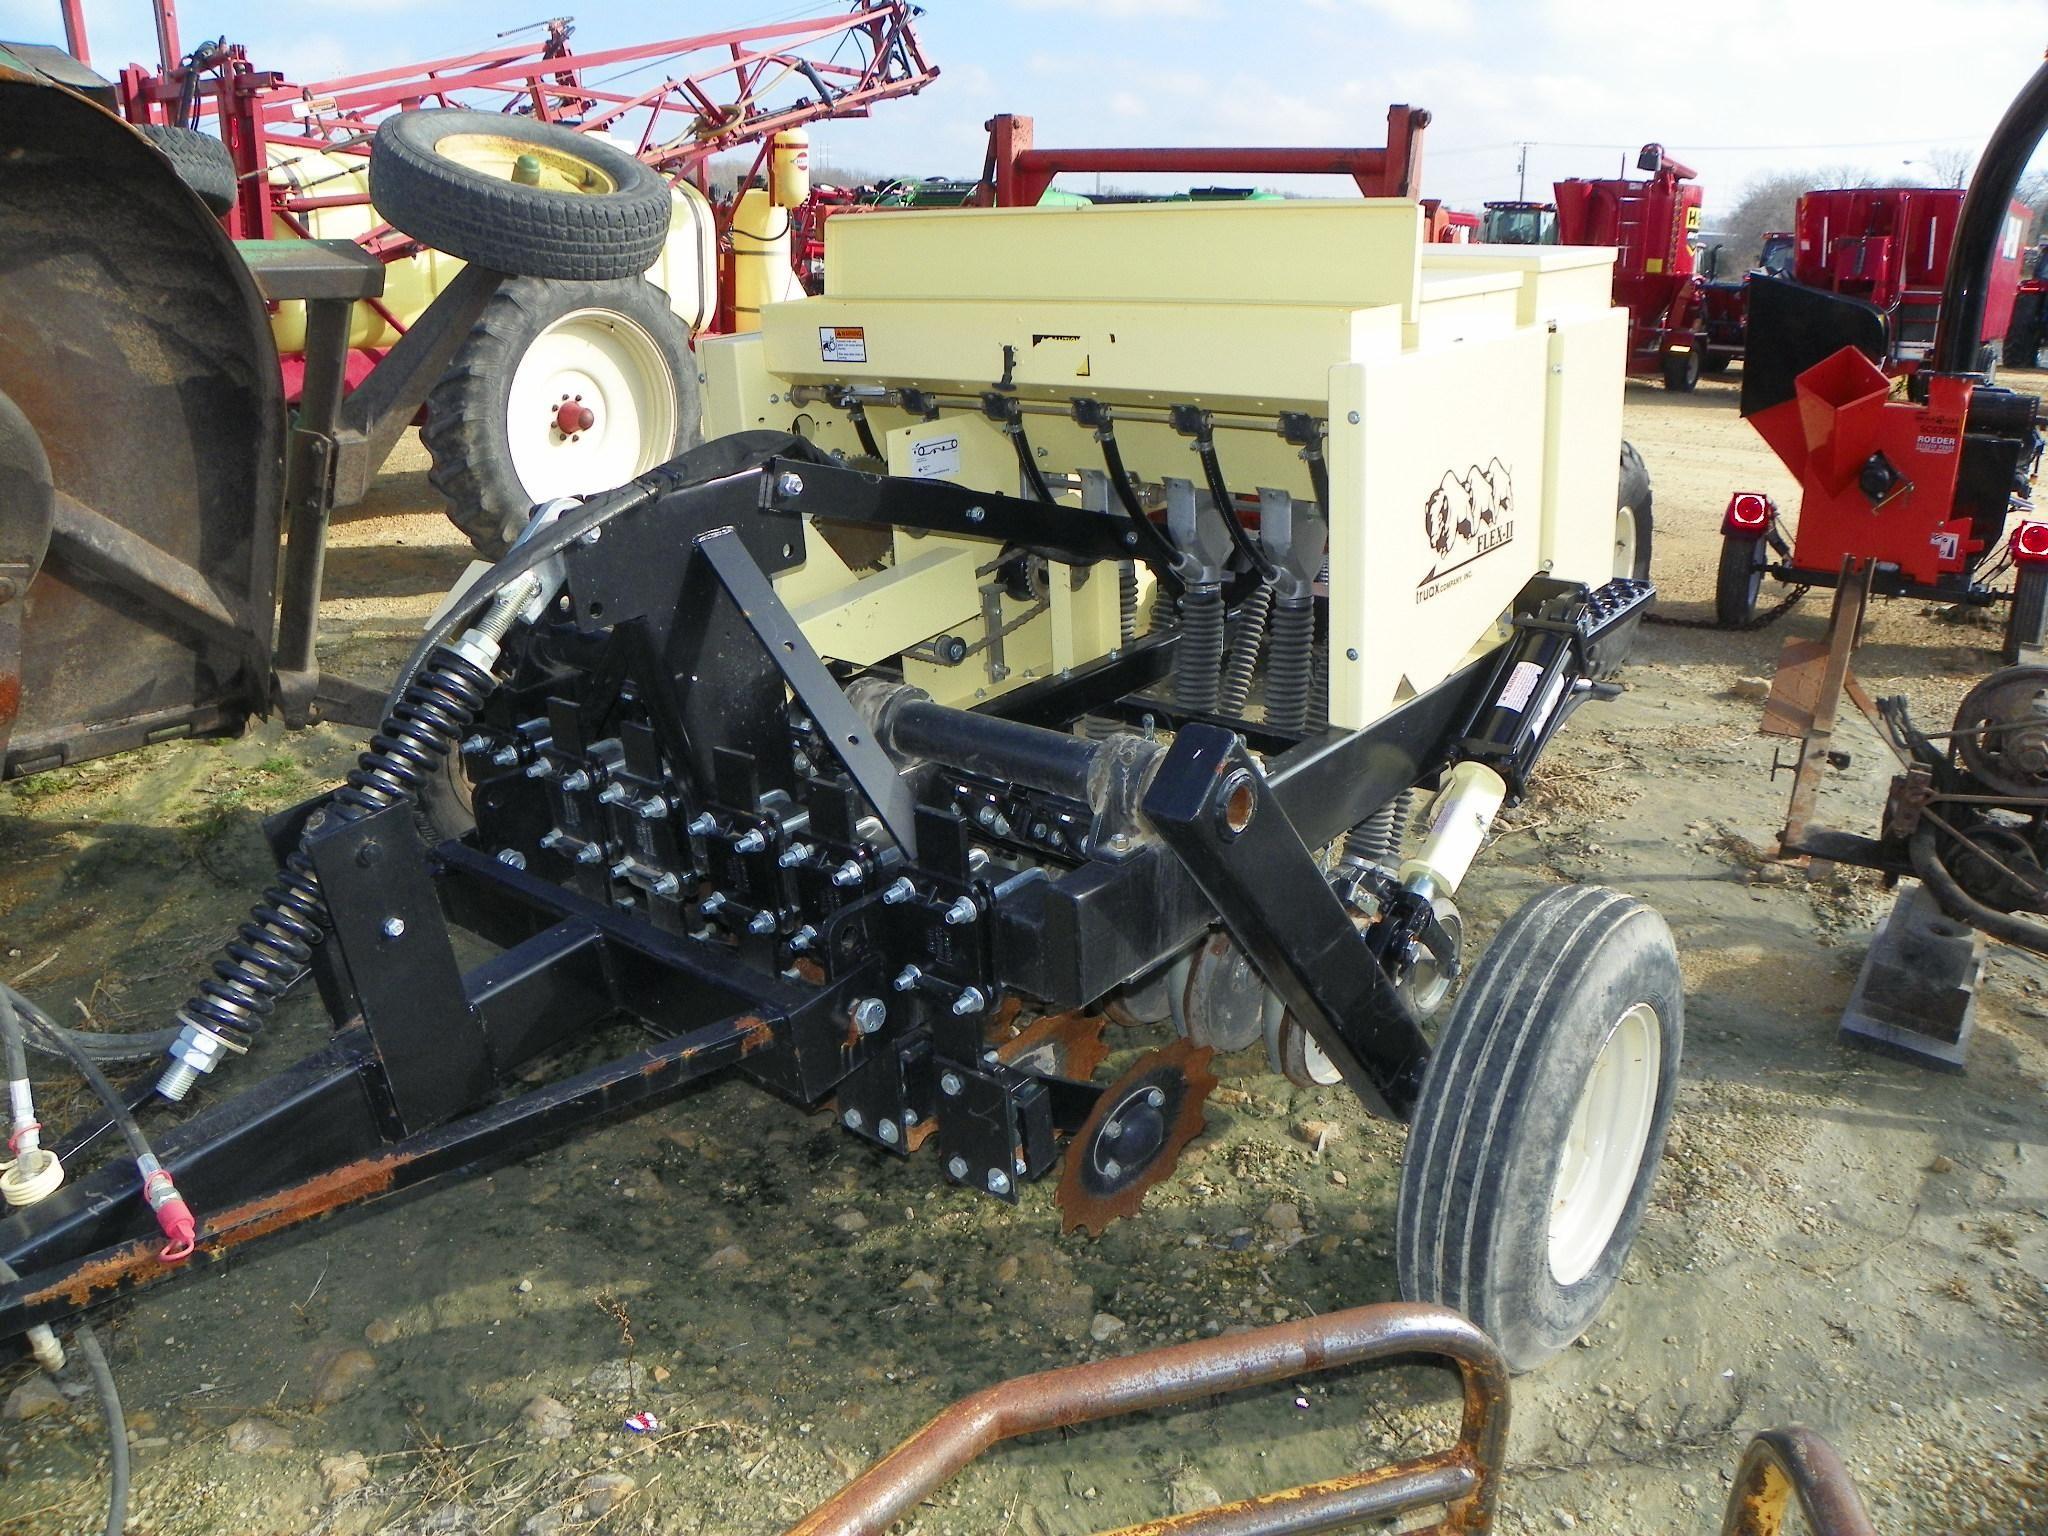 2009 TRUAX FLXII-86 Grain Drill